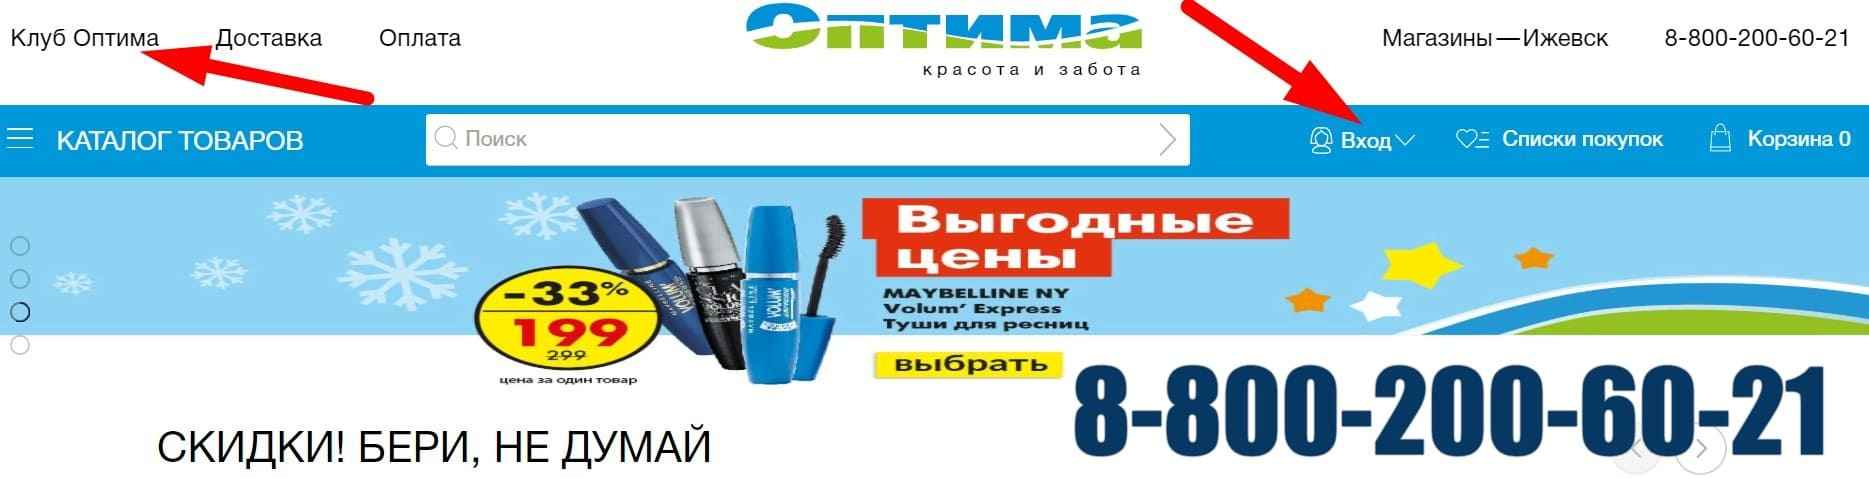 Мояоптима.рф регистрация